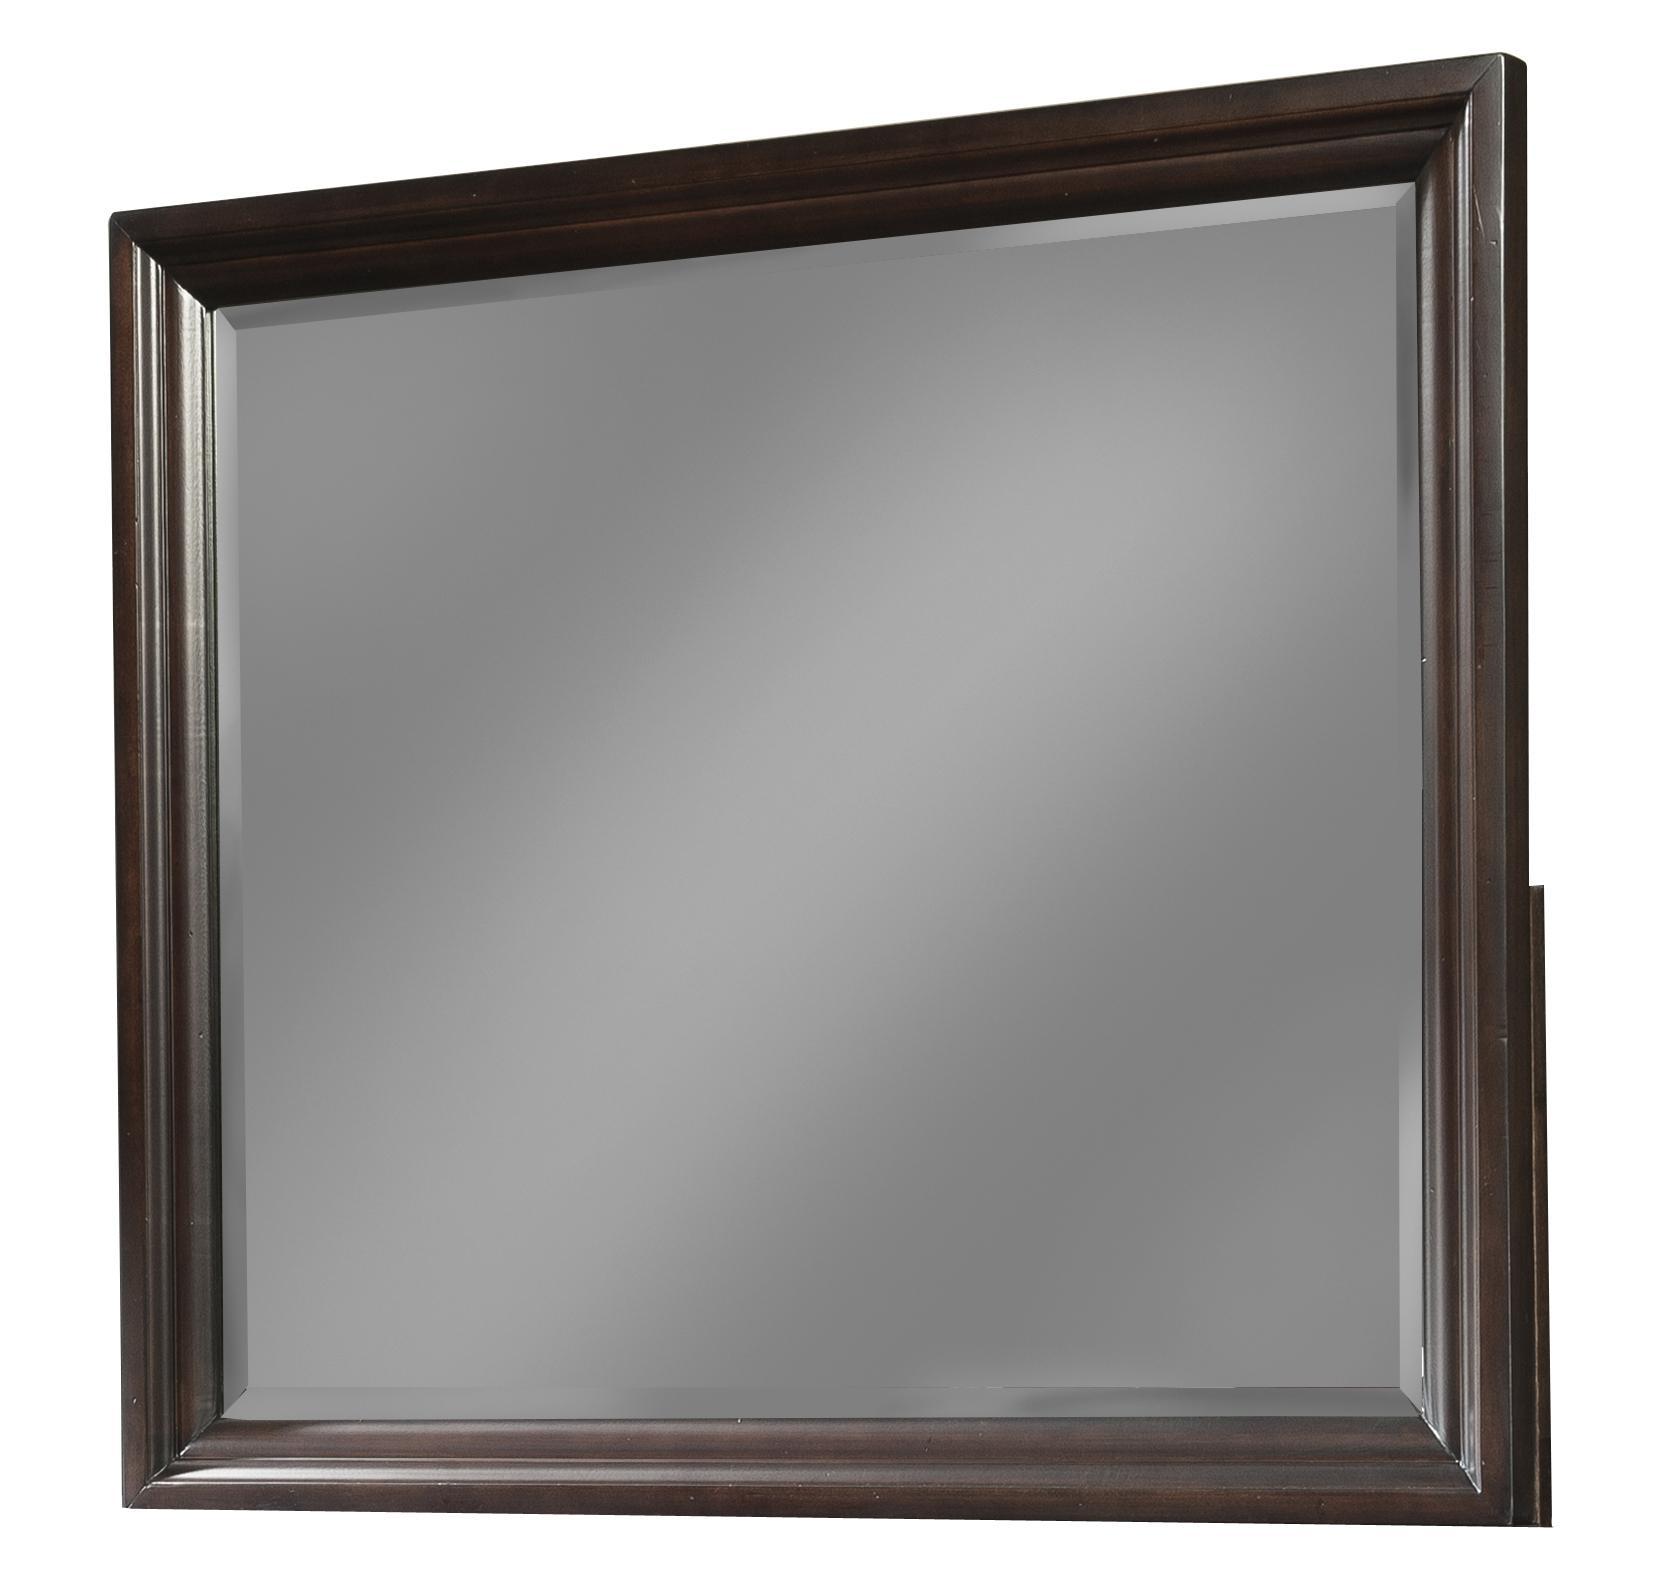 Cresent Fine Furniture Newport Mirror - Item Number: 1802